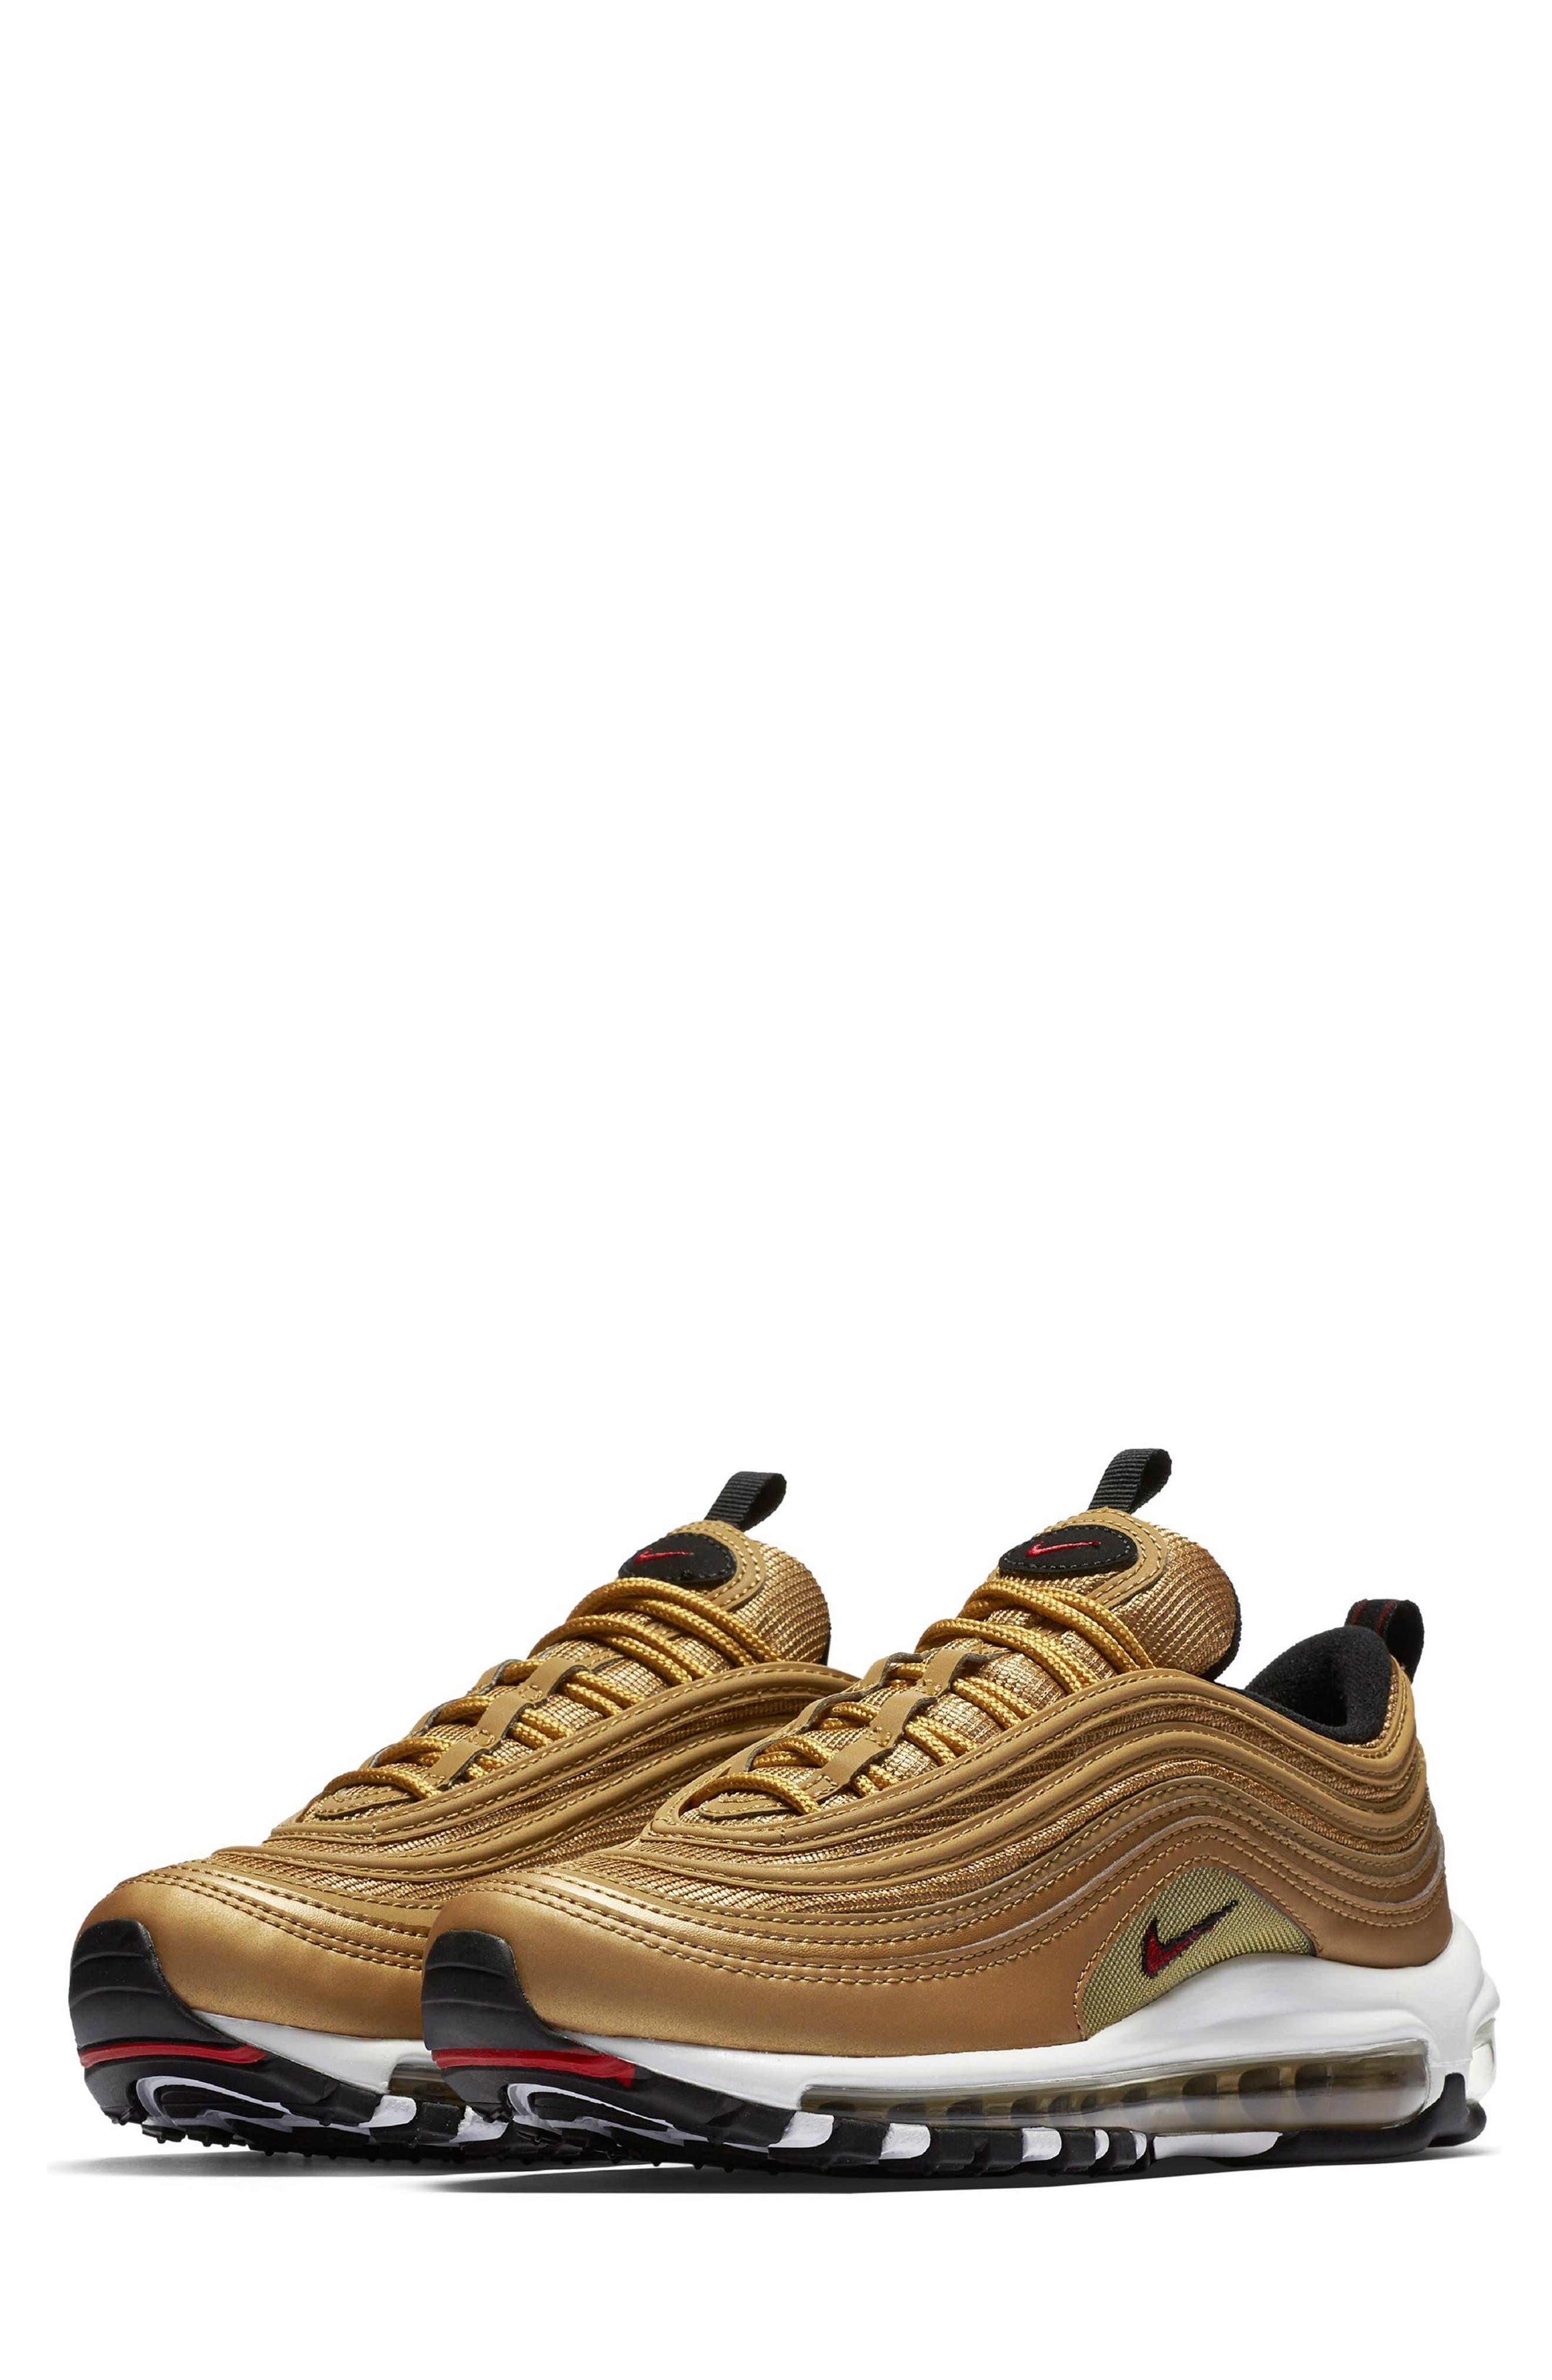 Air Max 97 OG Sneaker,                         Main,                         color, Gold/ Red/ White/ Black